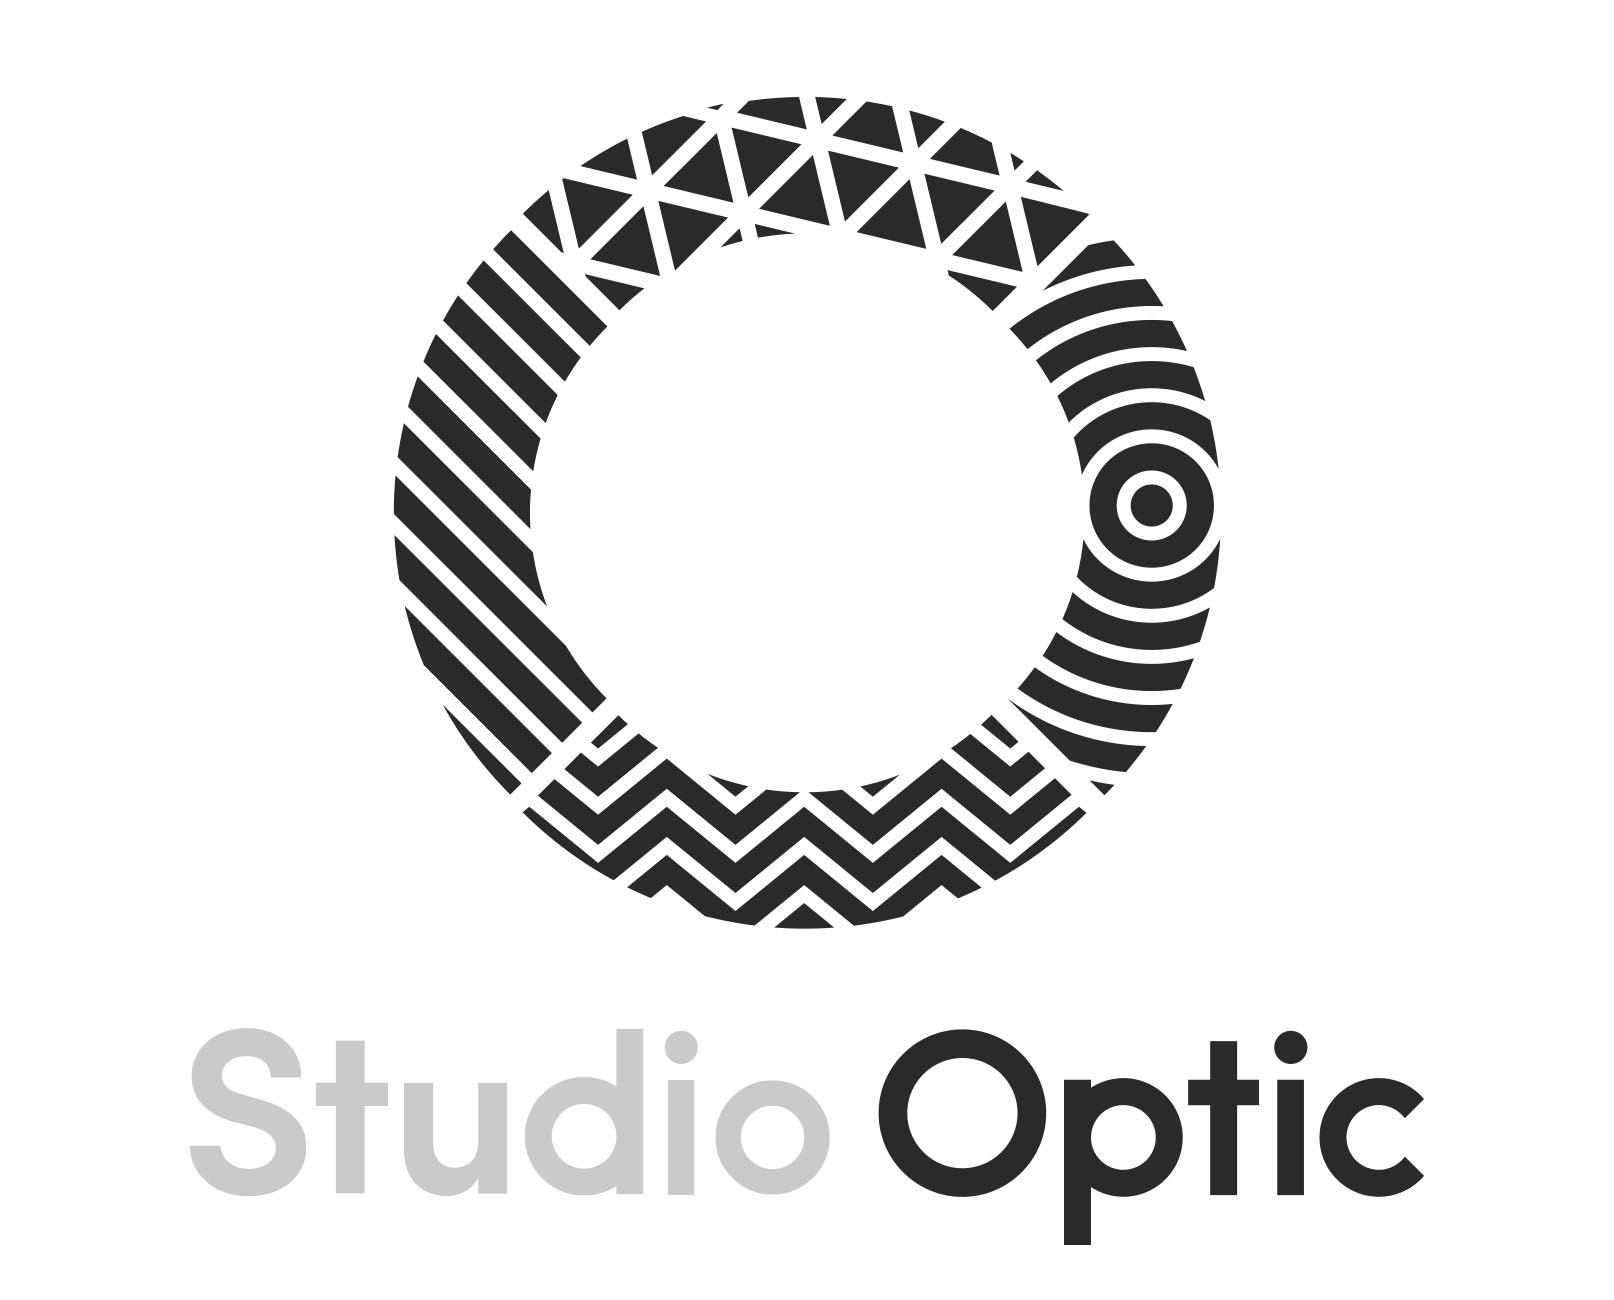 Studio Optic Logo_01.jpg